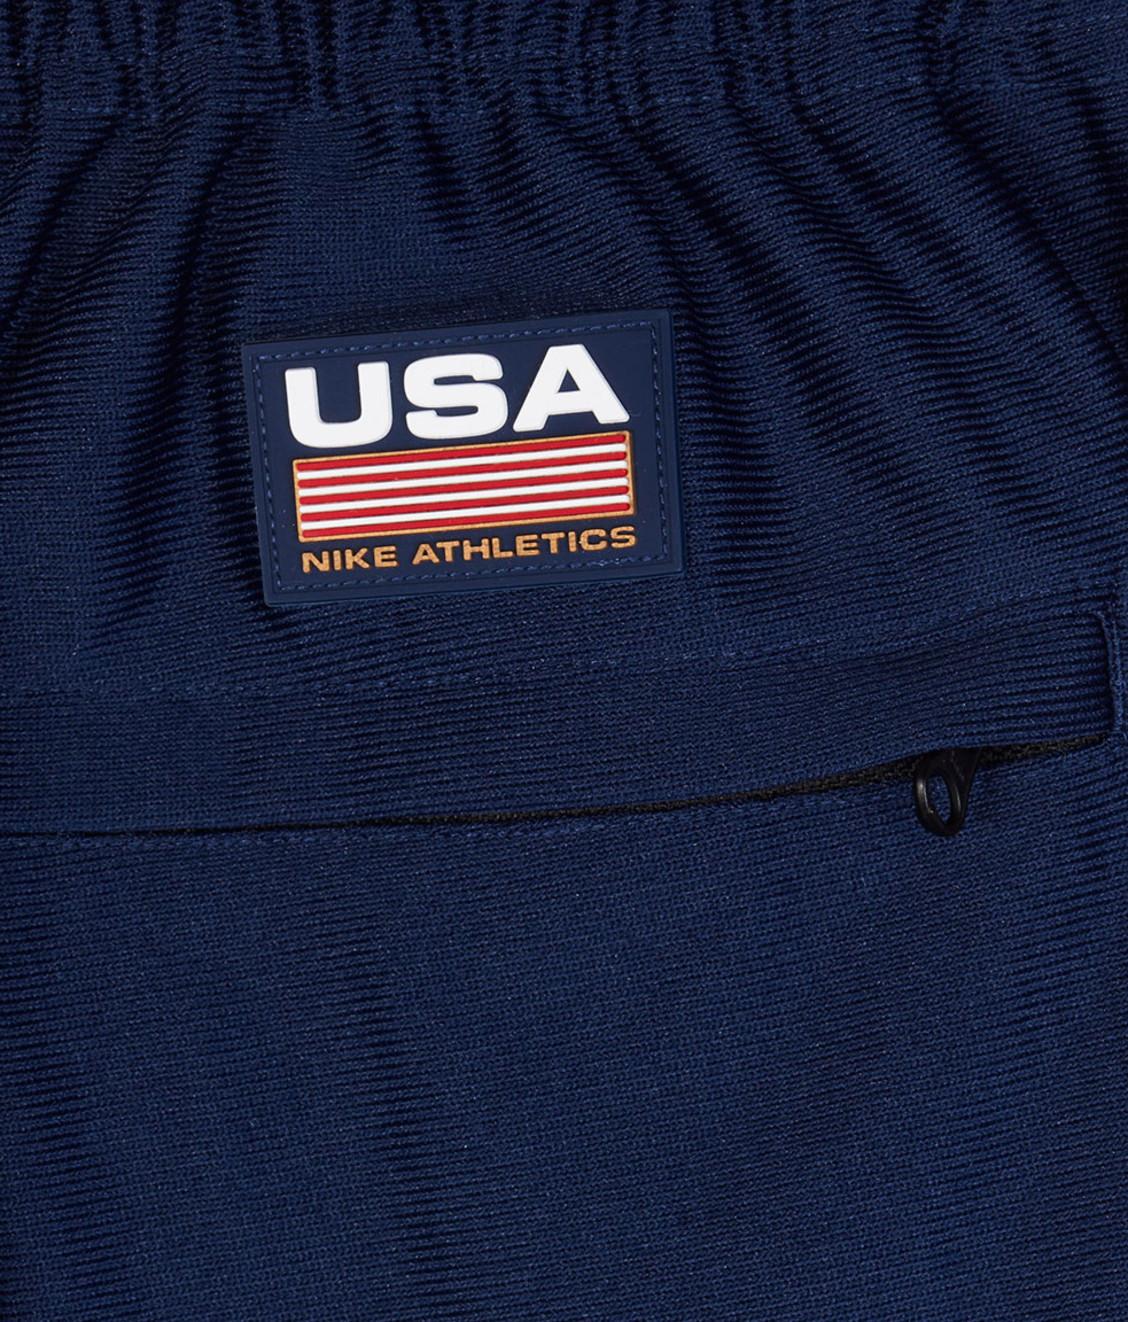 Nike Nike NRG Pant Solid Swoosh Stripe Navy